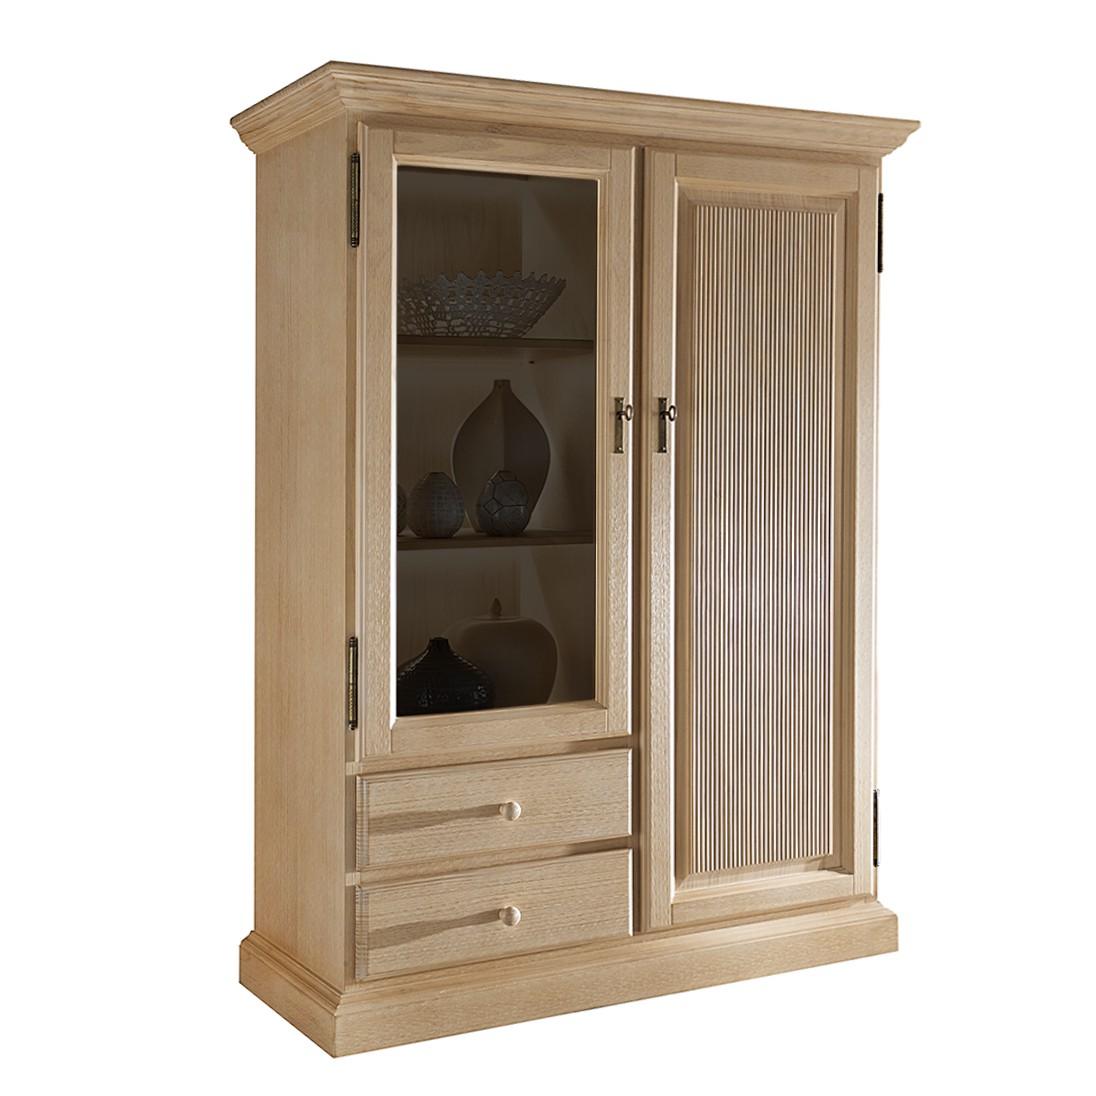 Home 24 - Armoire vitrine breddin iii - pin massif - sans éclairage, maison belfort